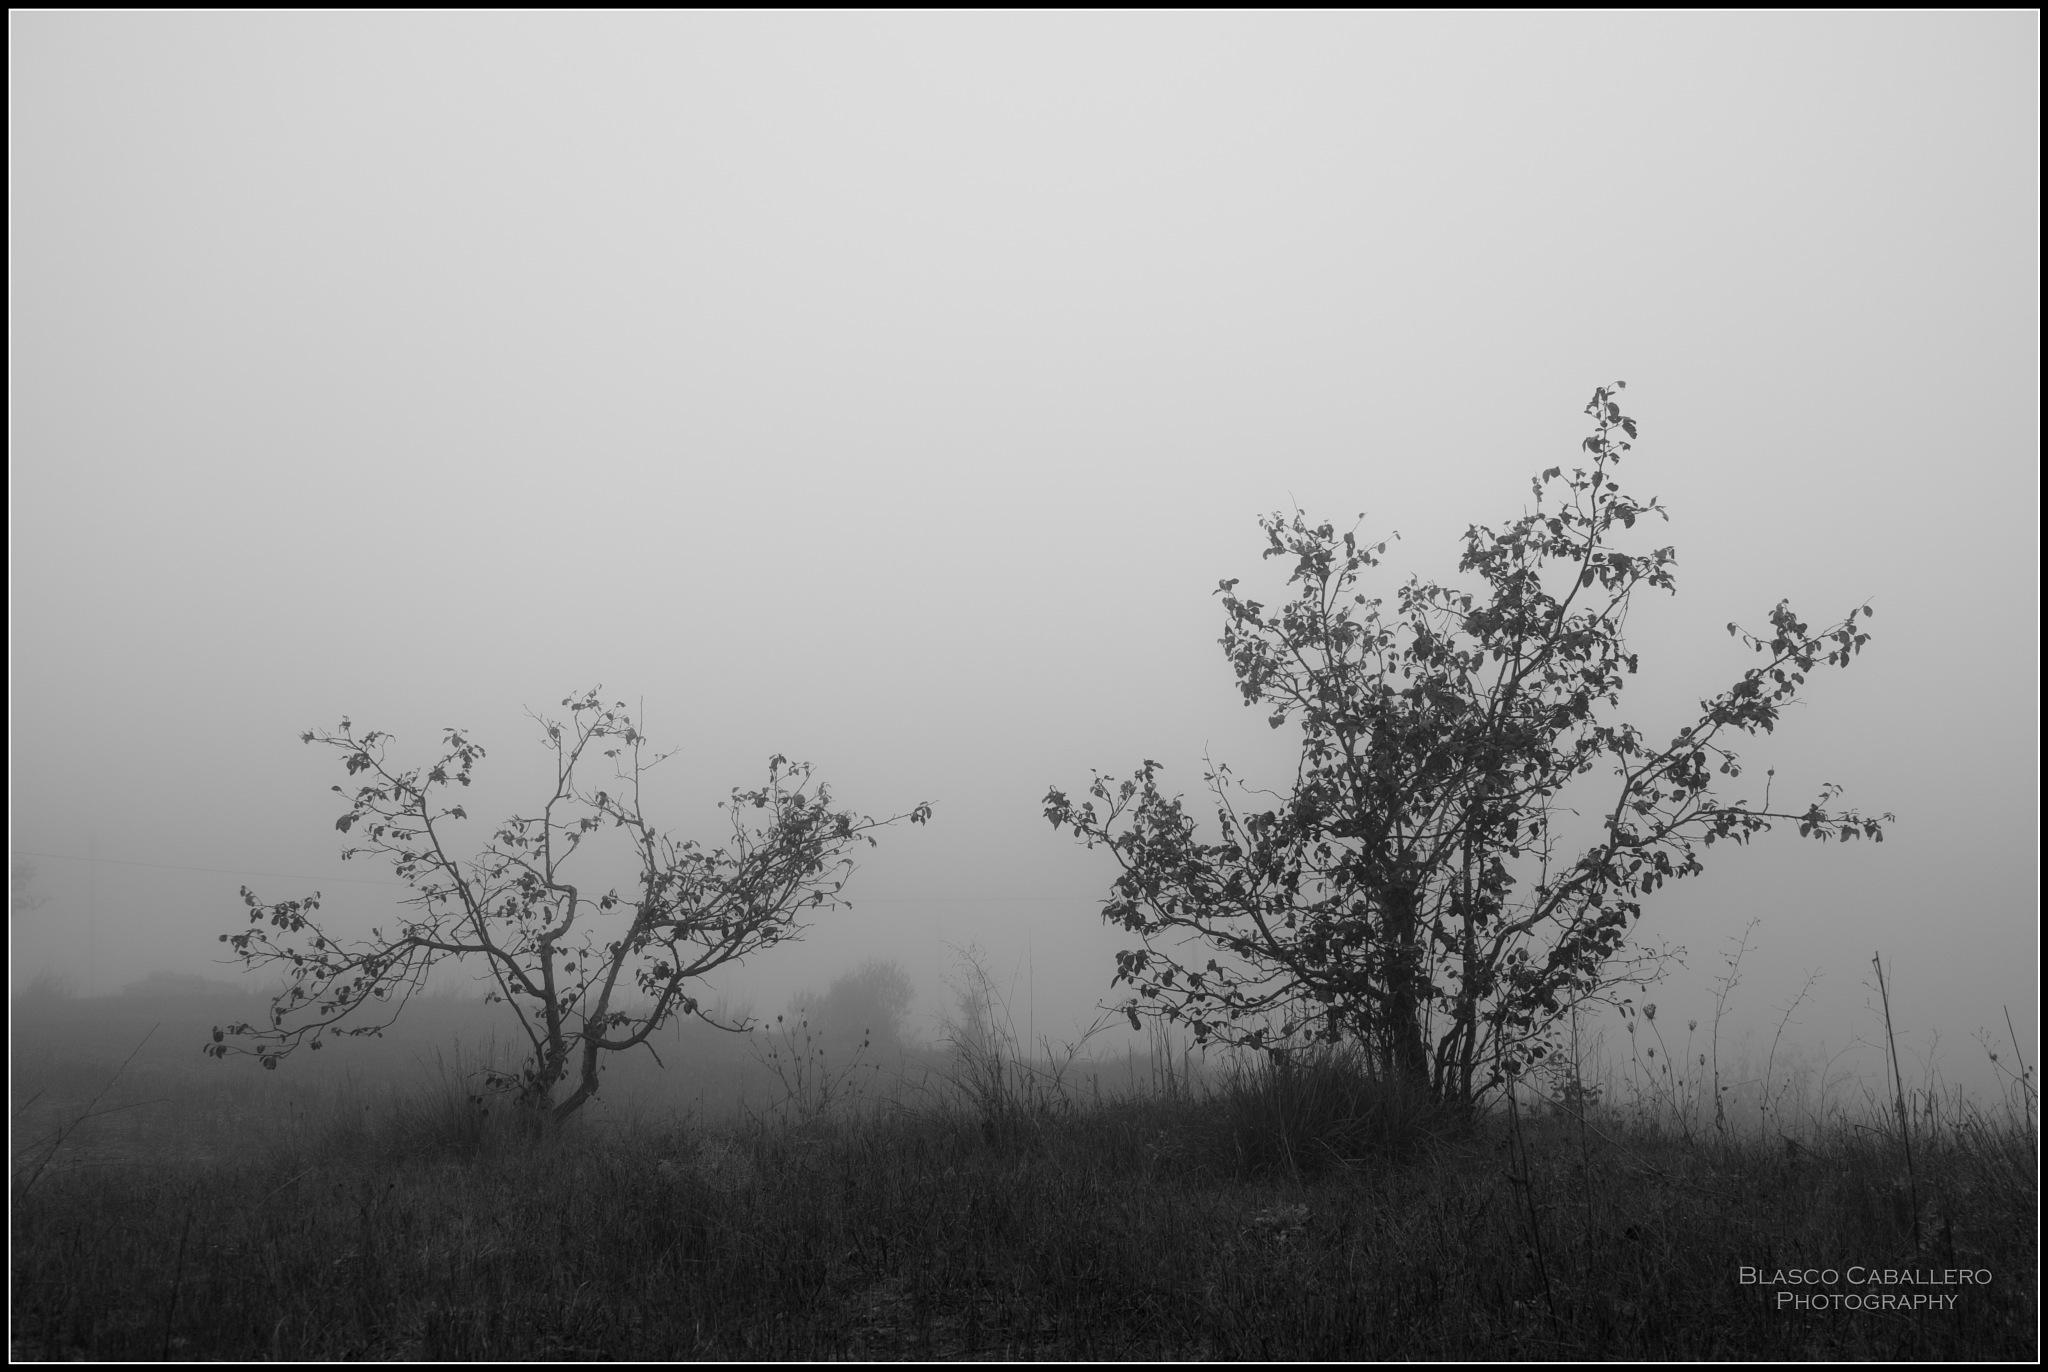 Fog II by Blasco Caballero